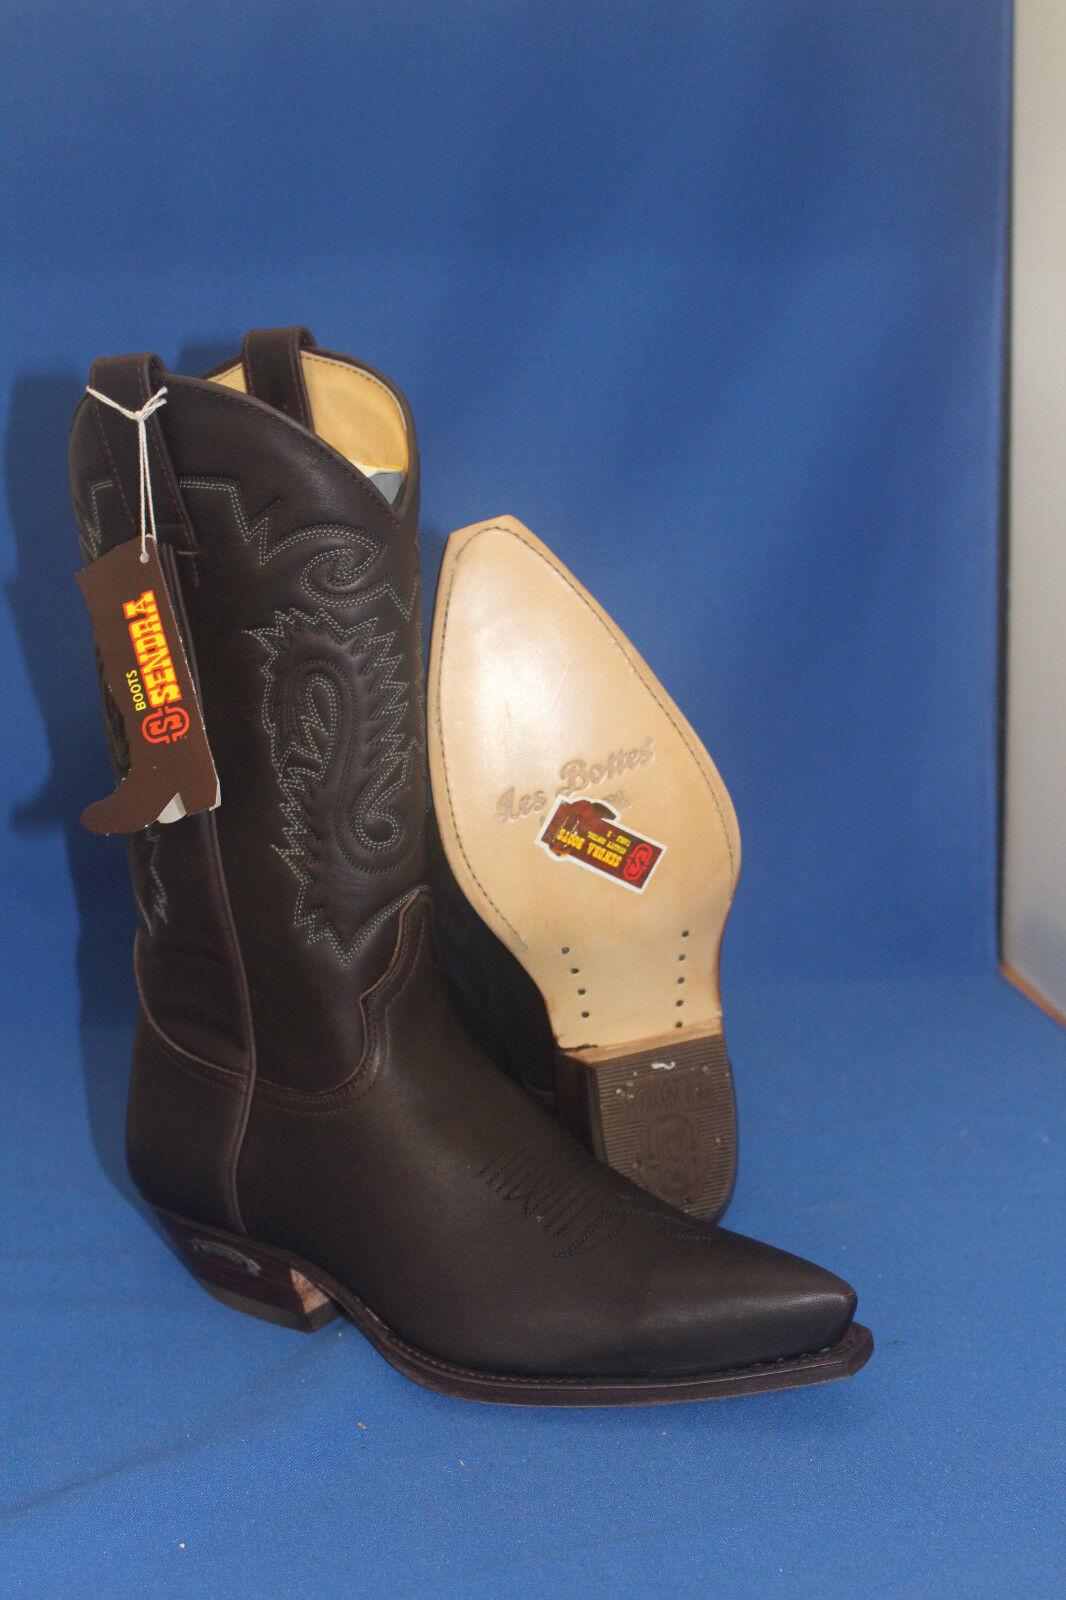 Sendra Stiefel cowboystiefel westernstiefel neu handmade braun cowboyStiefel    gr. 41 fea55c